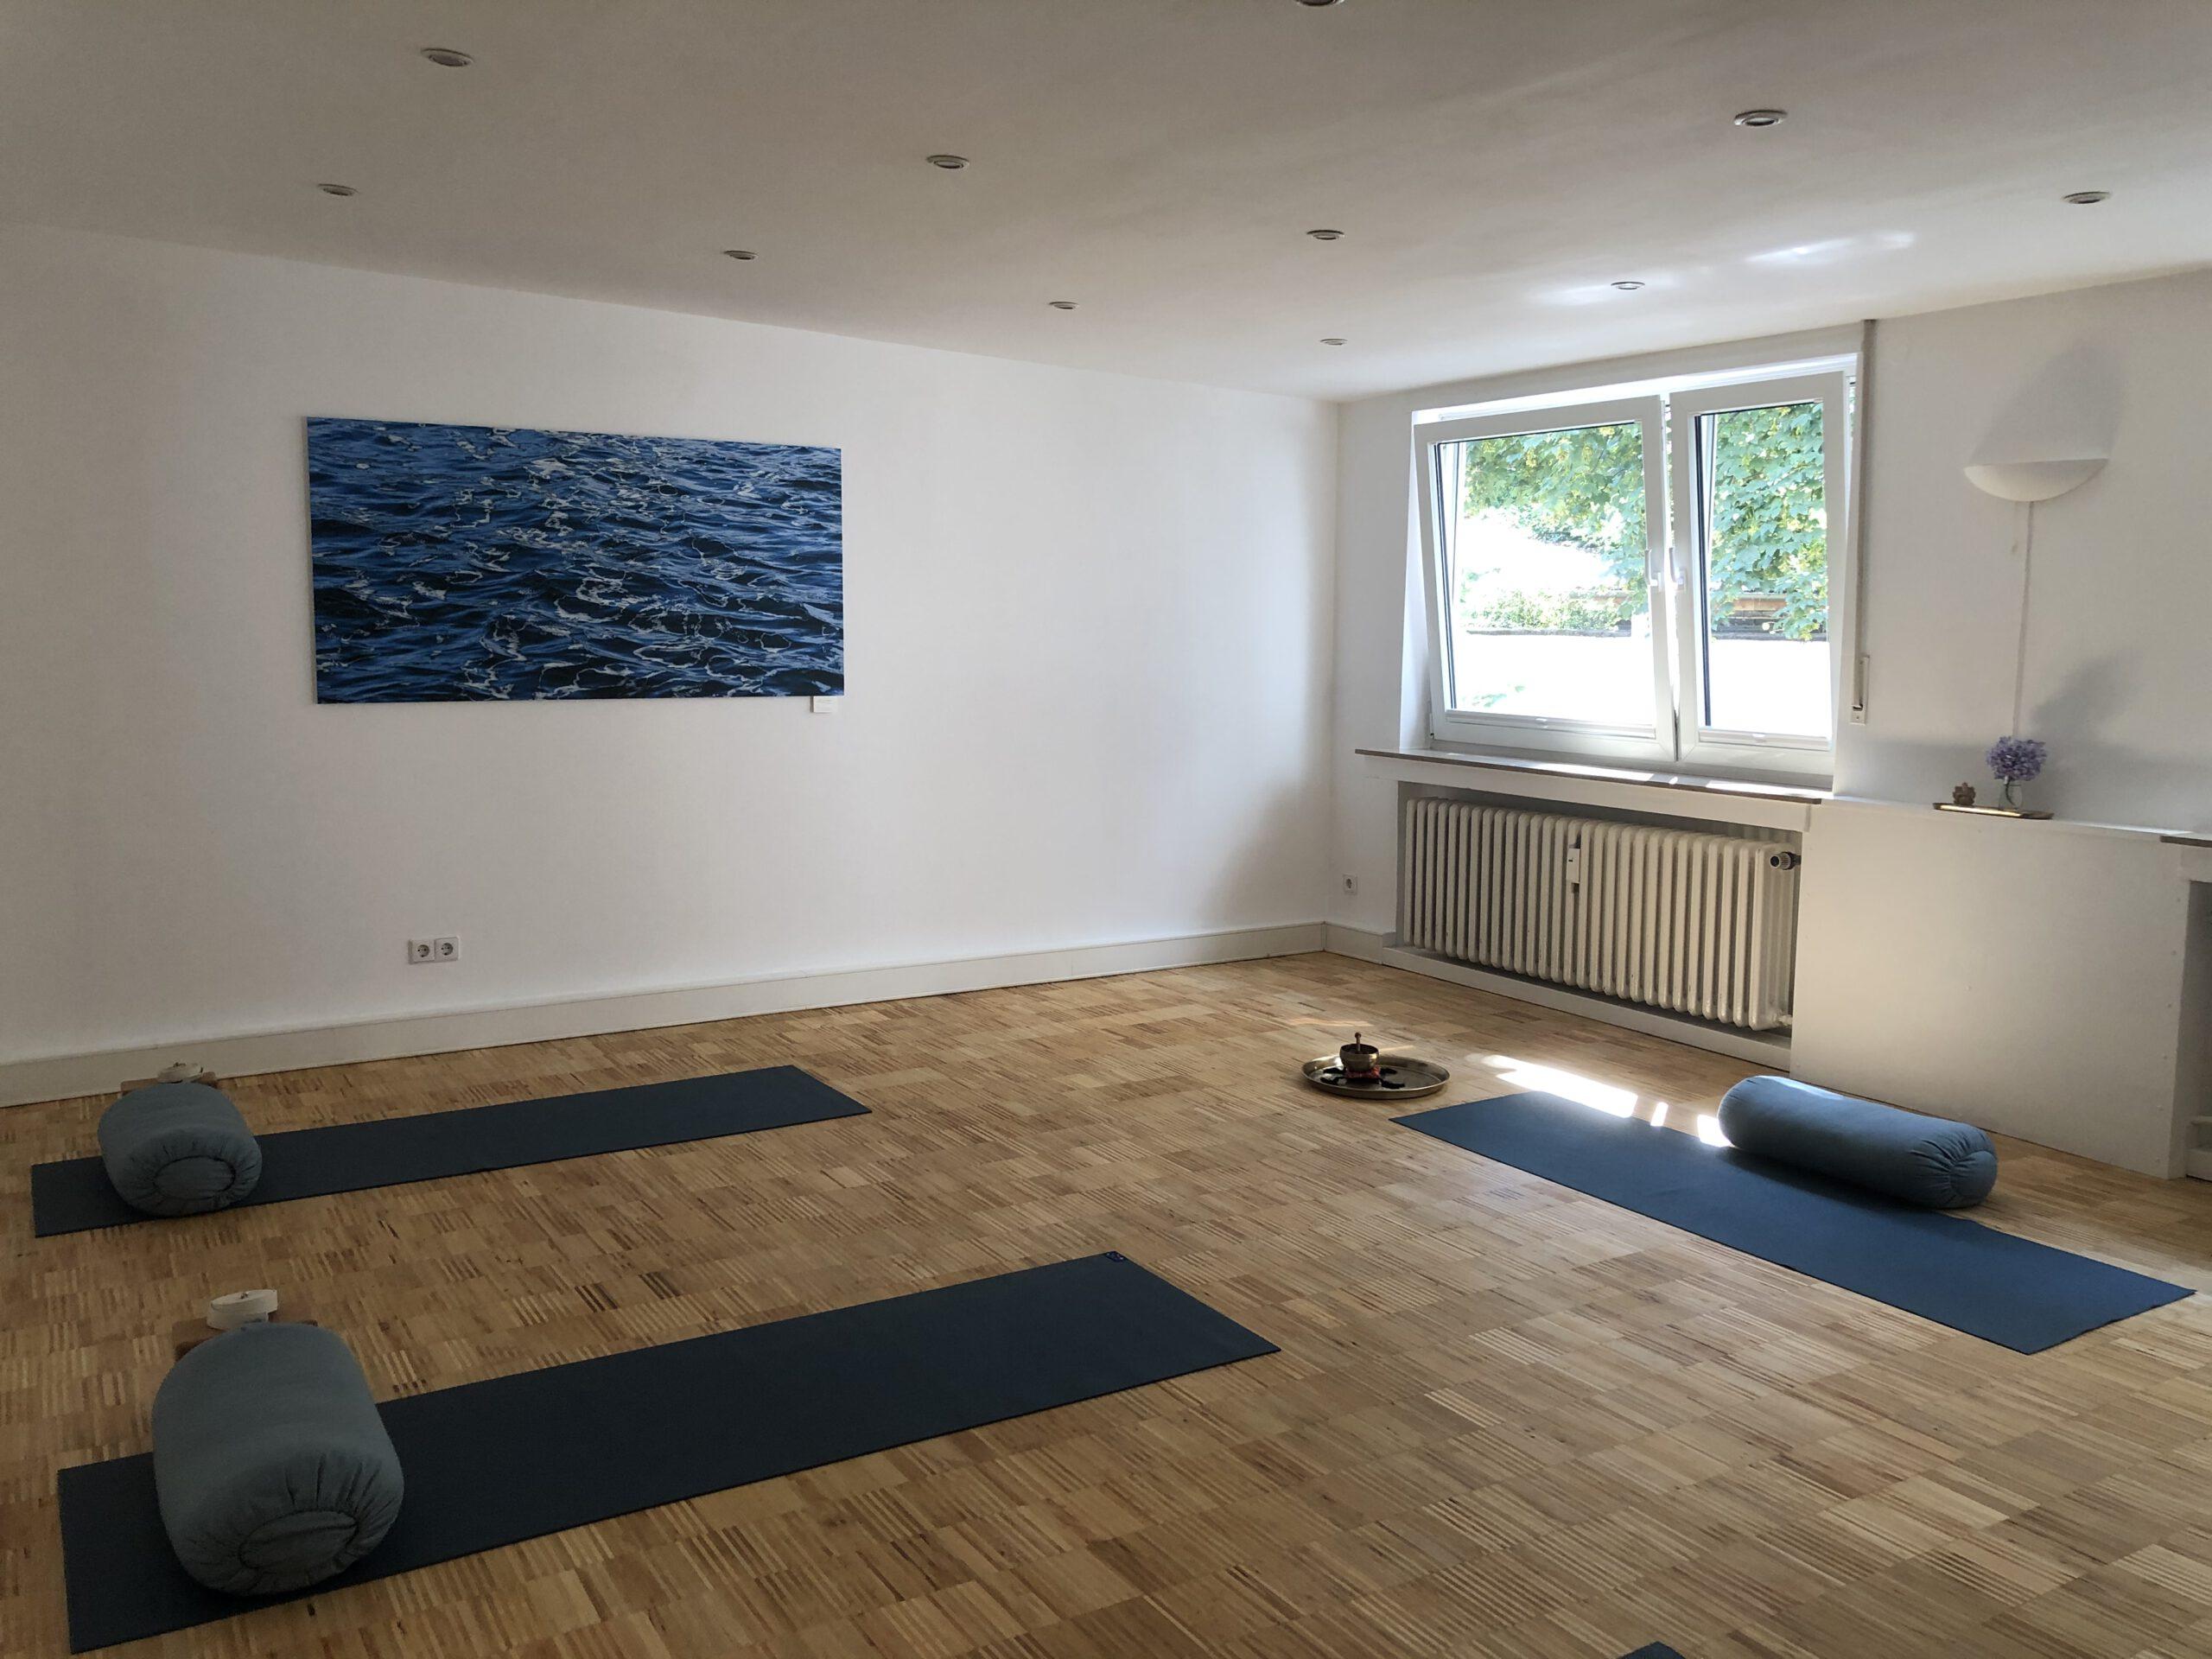 Raum am Fluss – Yoga-Raum